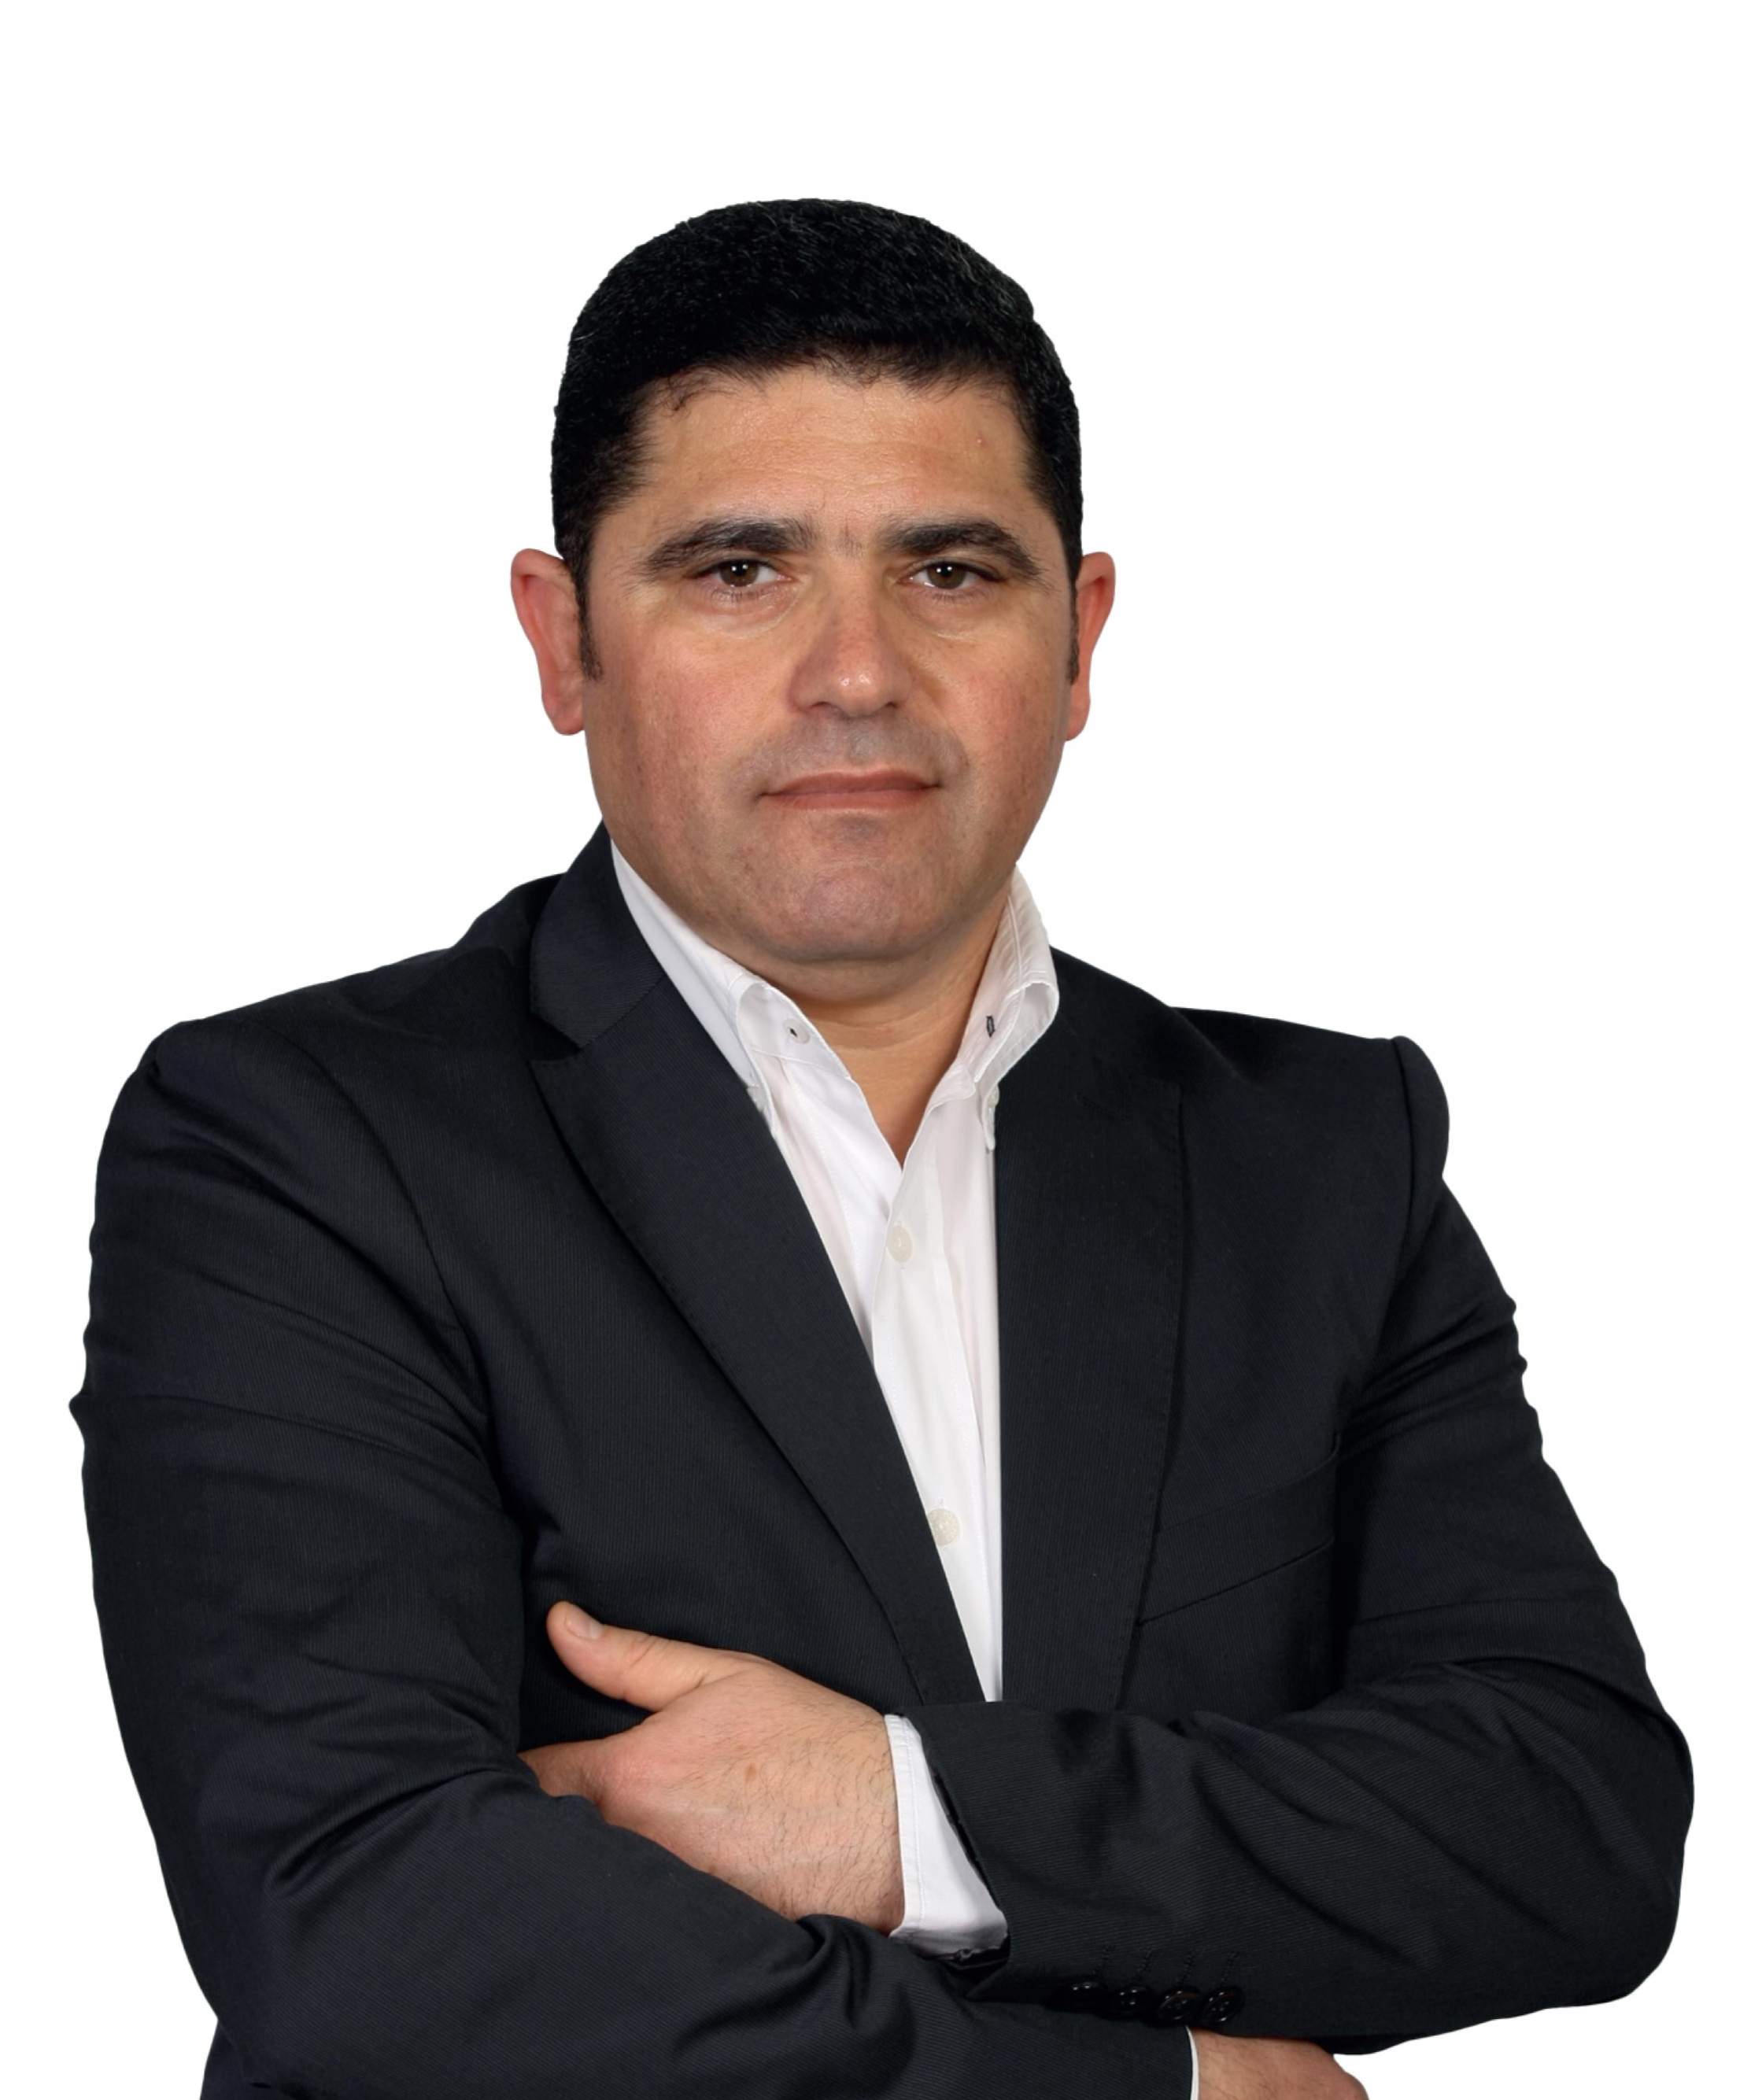 Vitor Martins